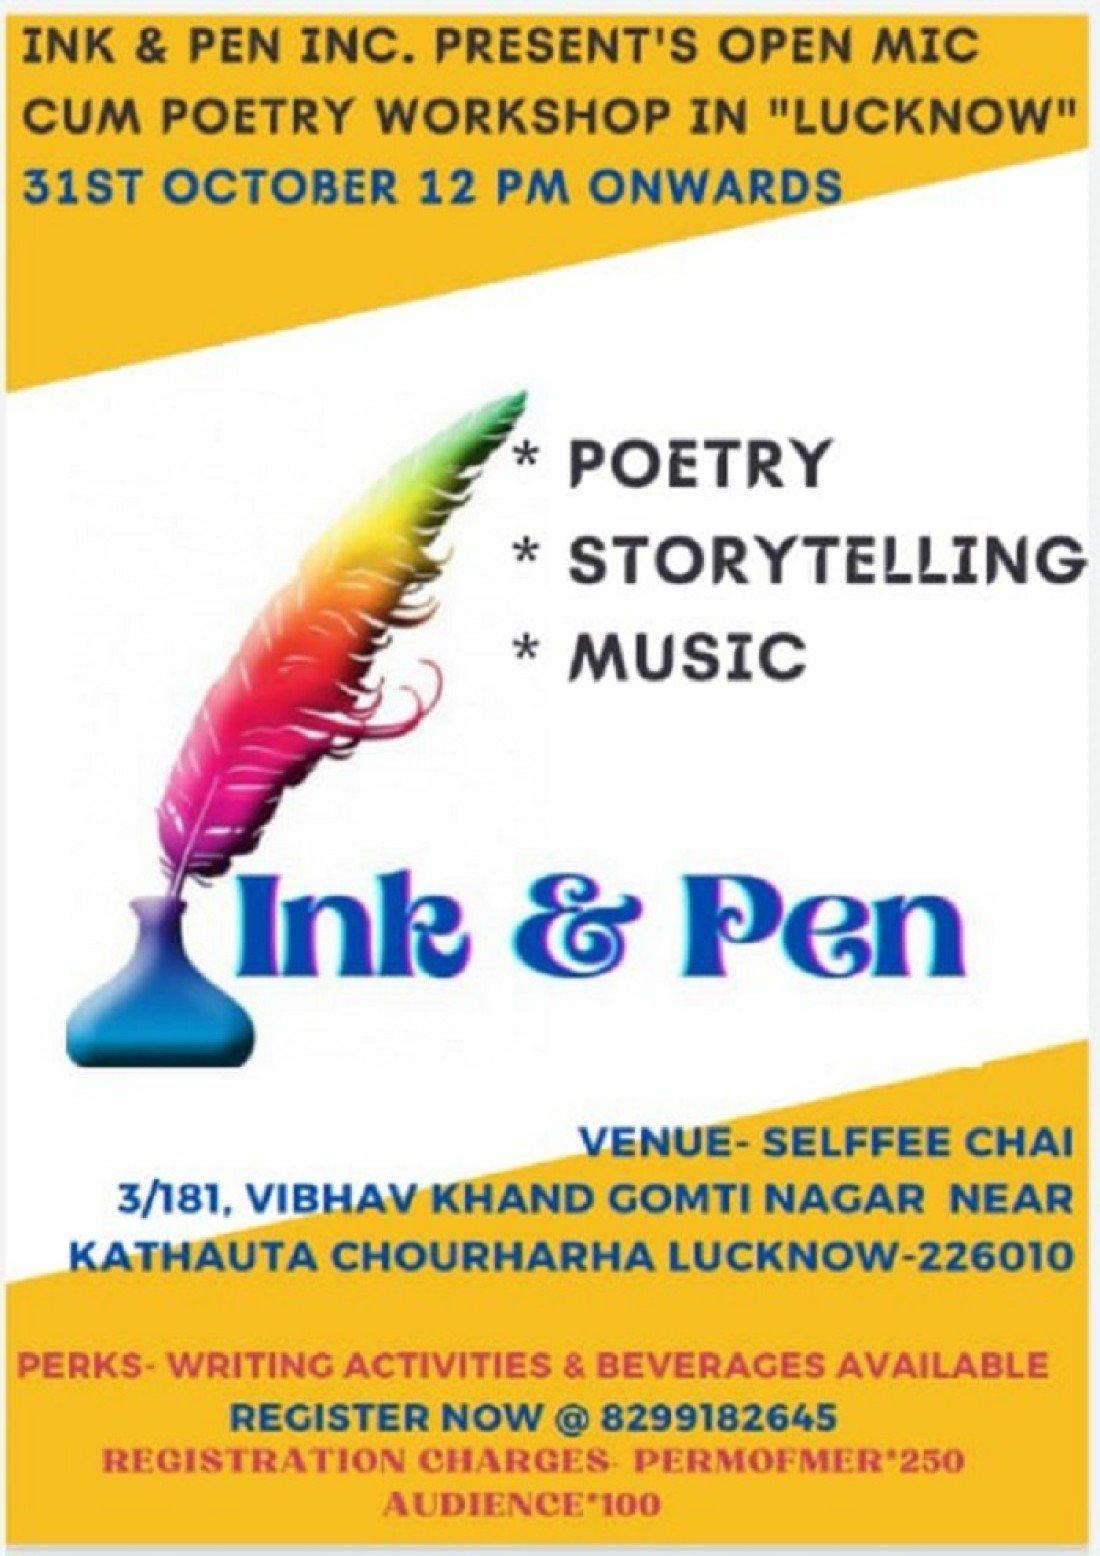 Ink & Pen open mic ( Poetry), 31 October | Event in Lucknow | AllEvents.in